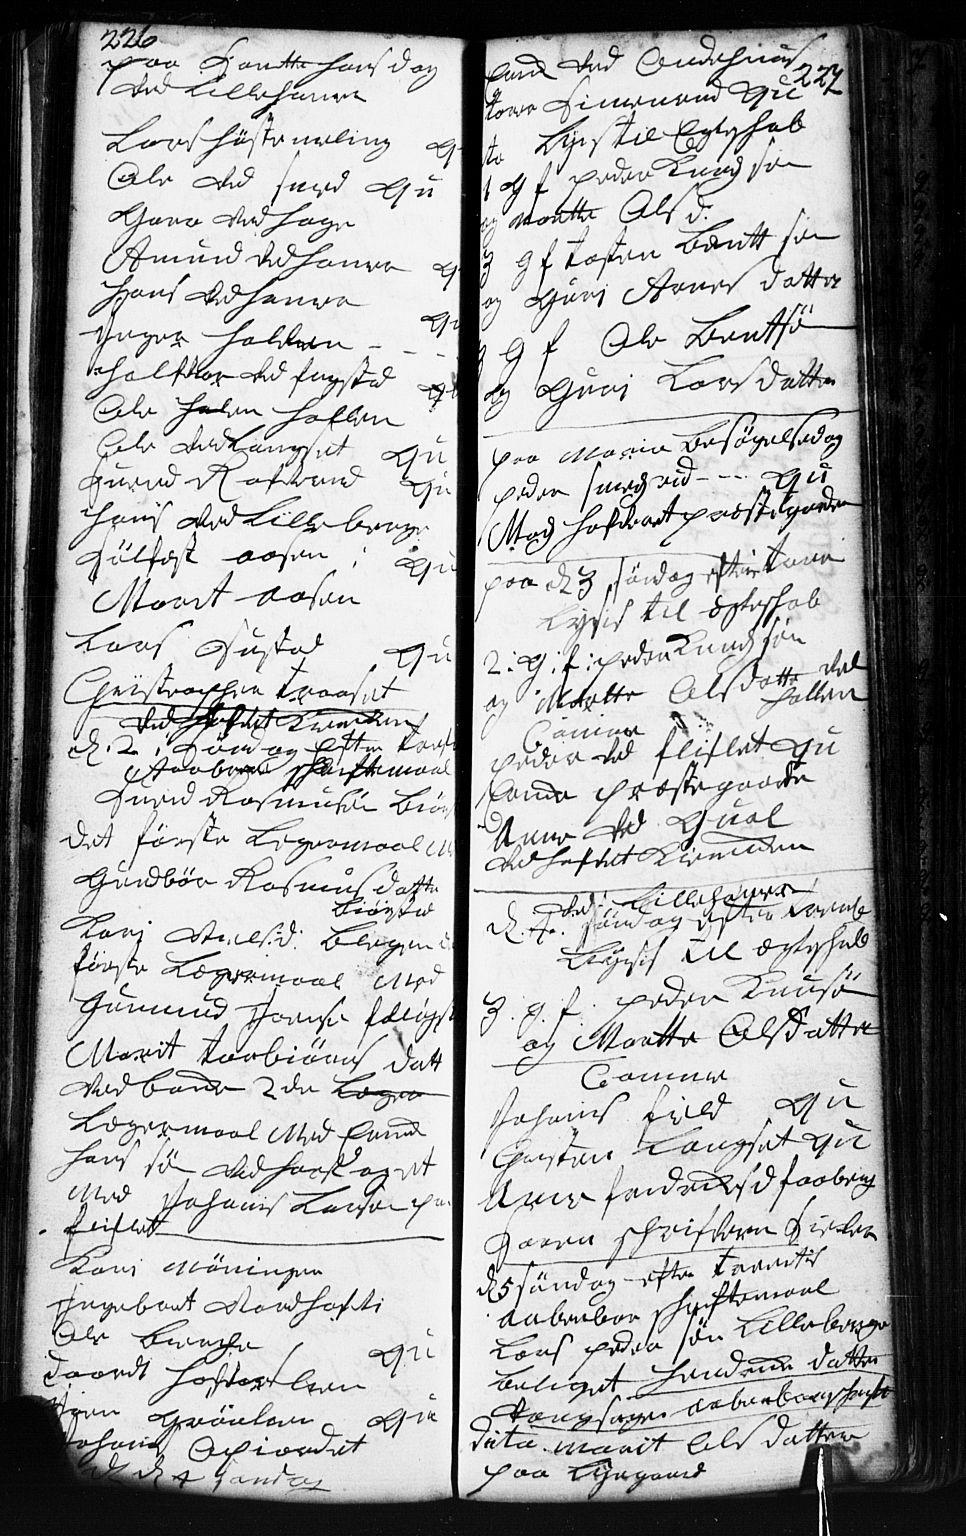 SAH, Fåberg prestekontor, Klokkerbok nr. 2, 1741-1756, s. 226-227